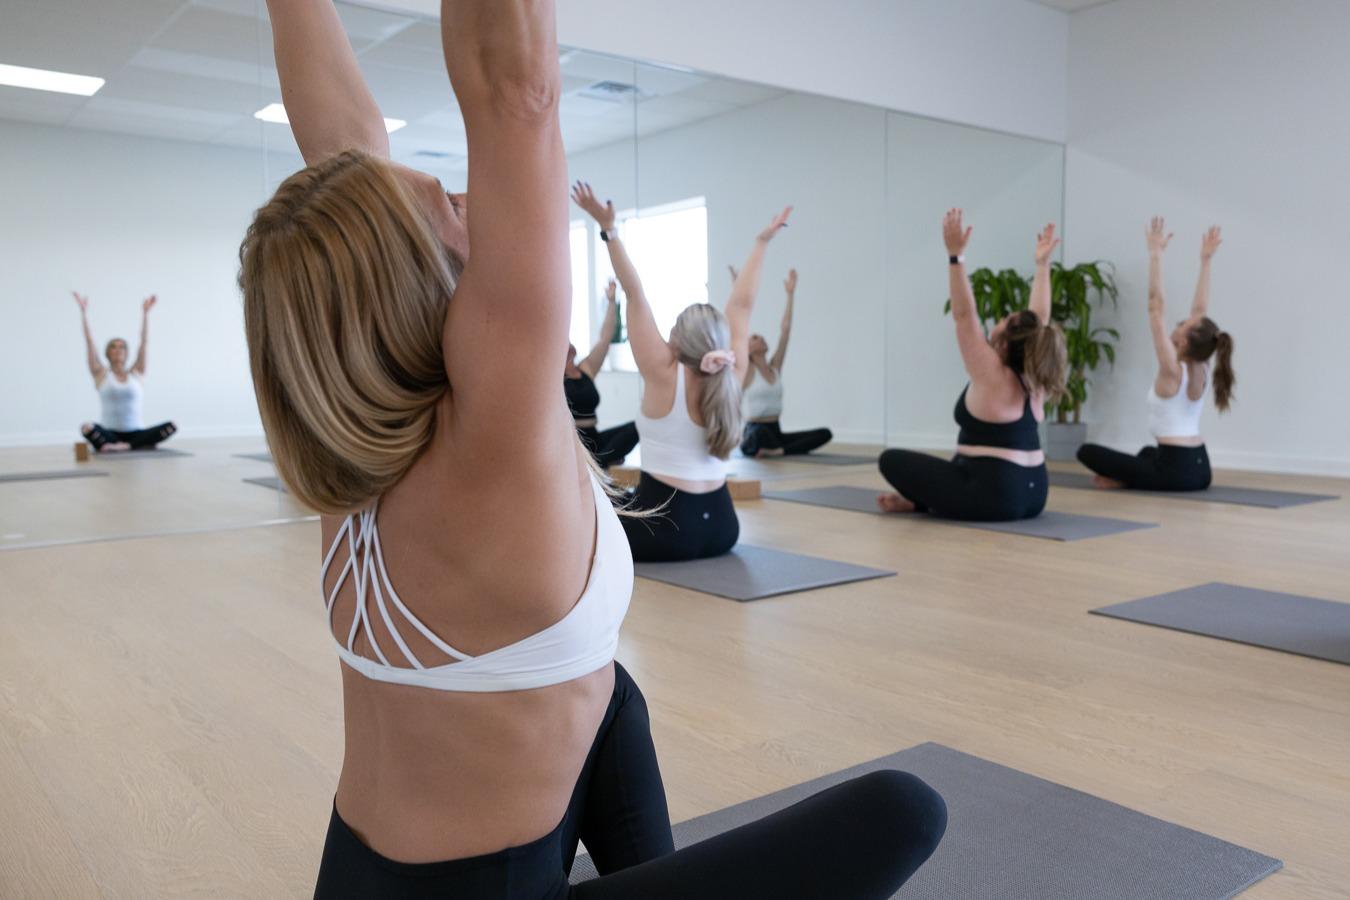 Sweat Shop Hot Yoga Oconomowoc Yoga Group Class 9 Resize